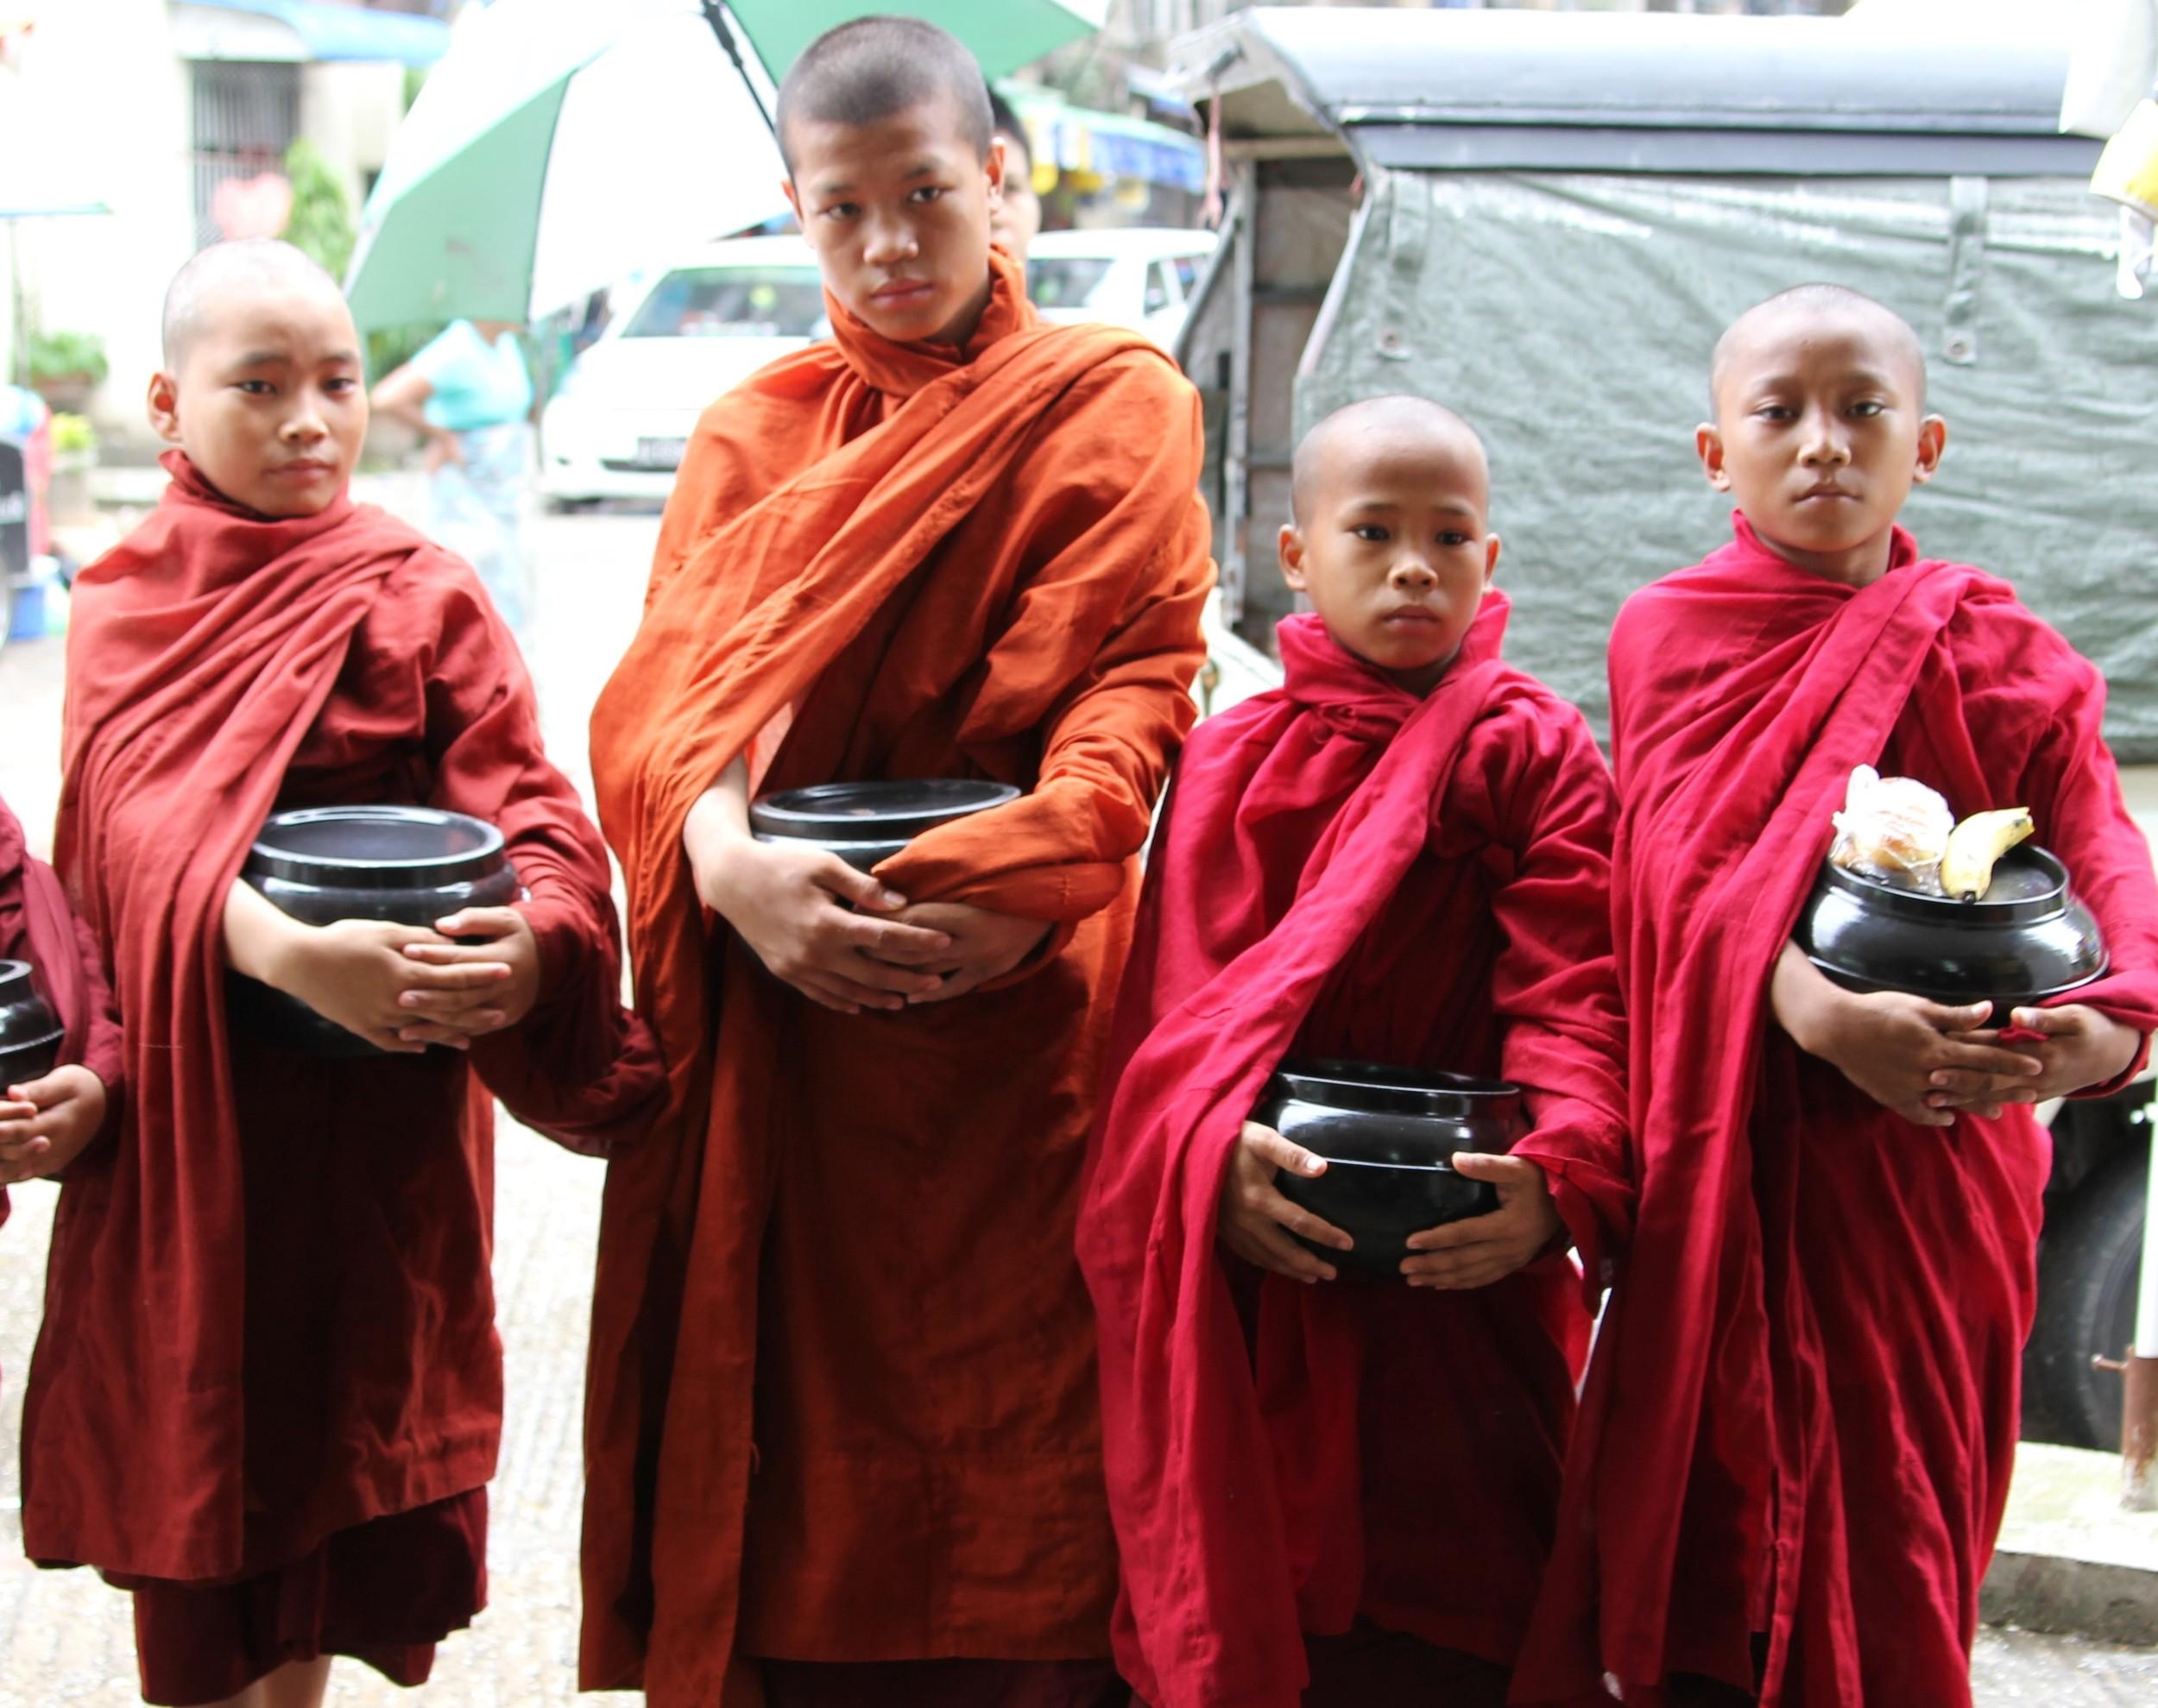 Buddhist Novices 1 - Copy.JPG